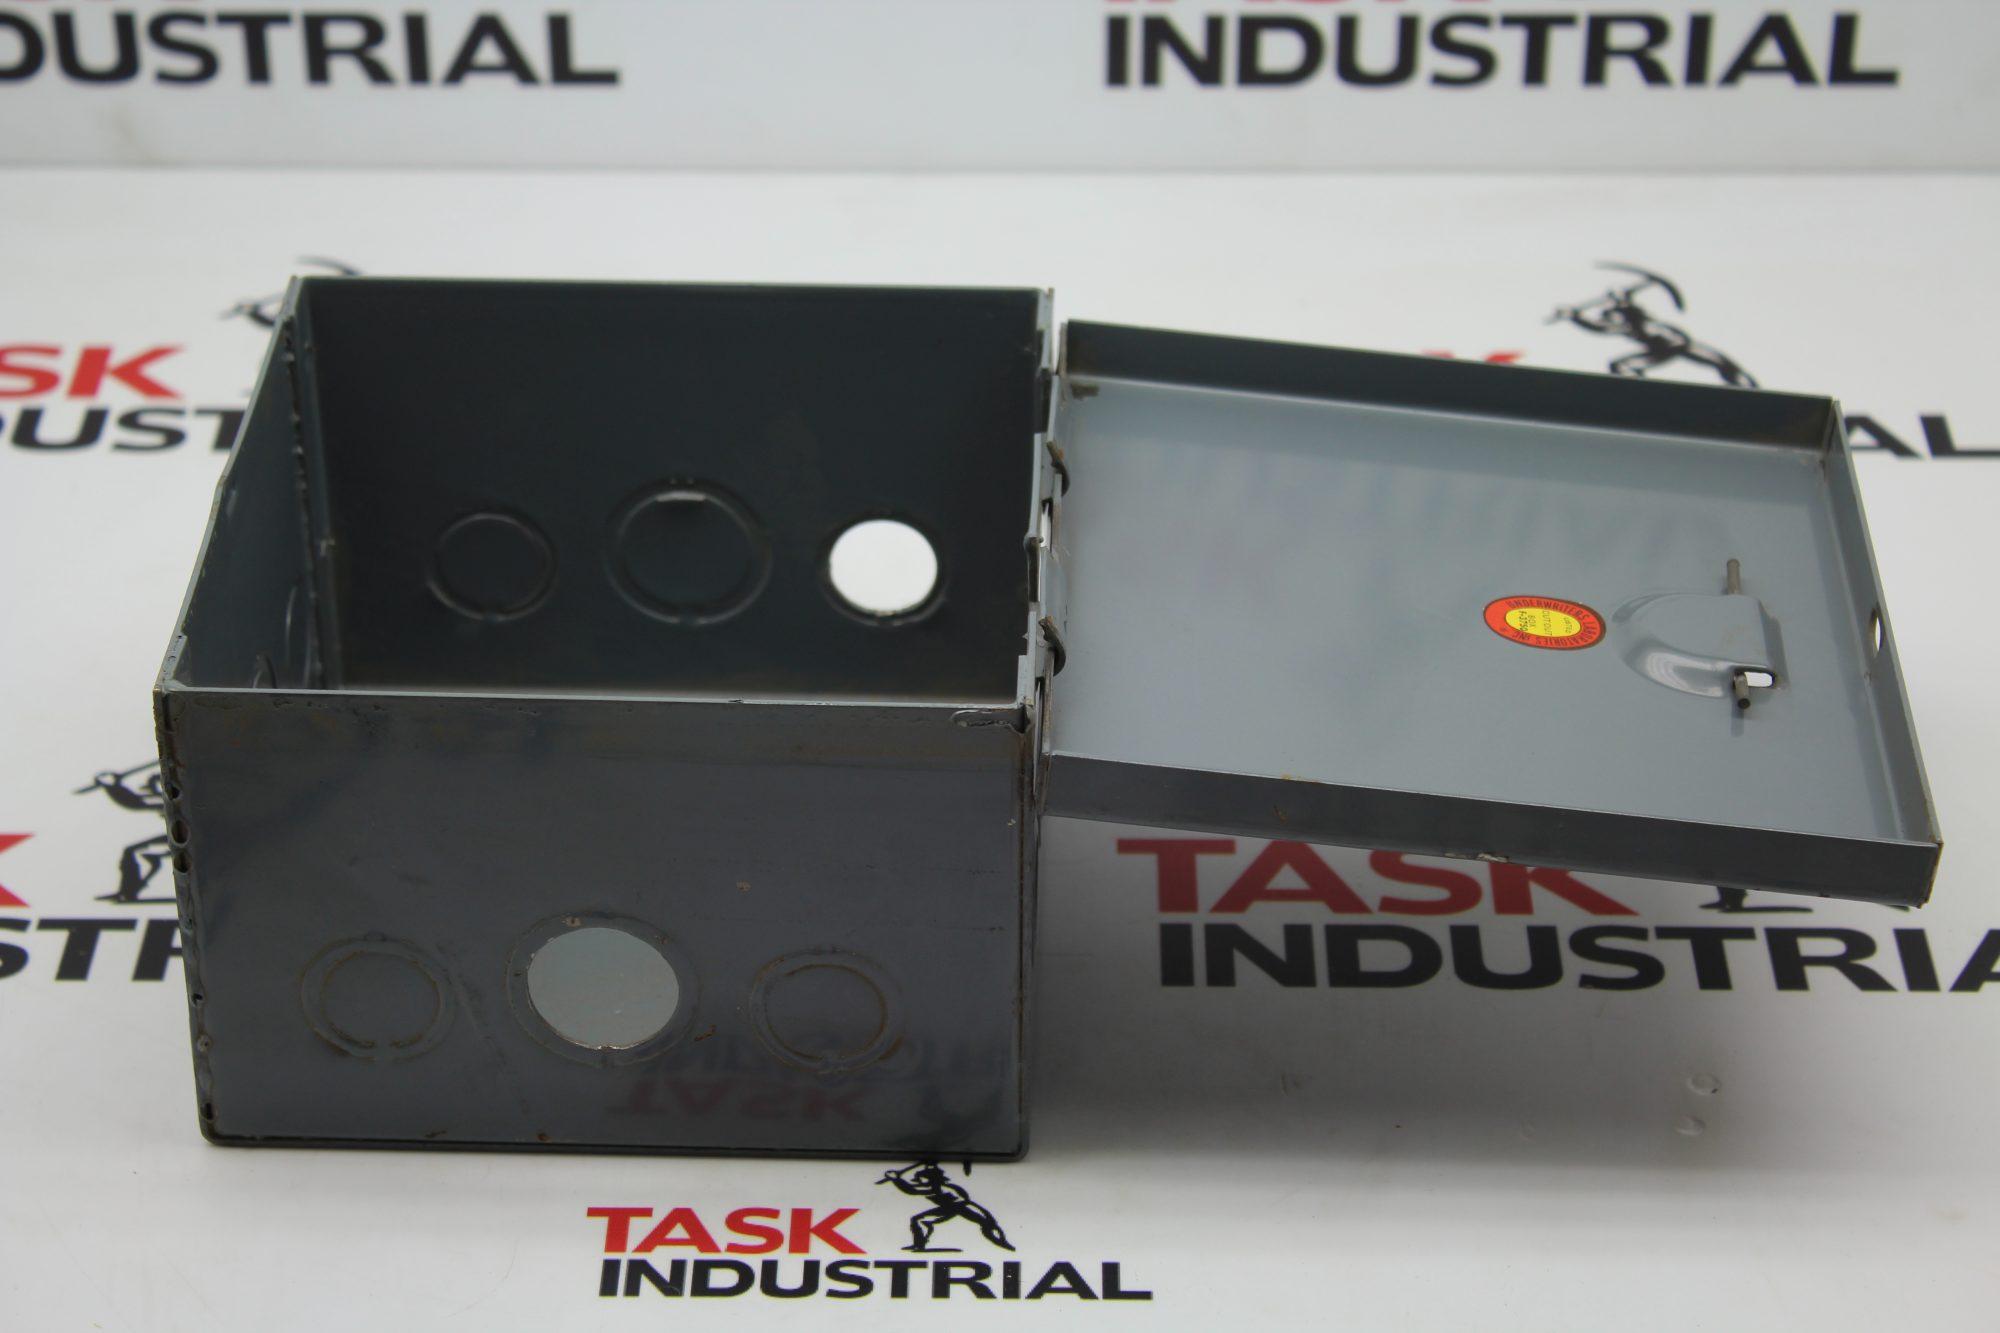 Underwriters Laboratories F-3750 Box Enclosure.